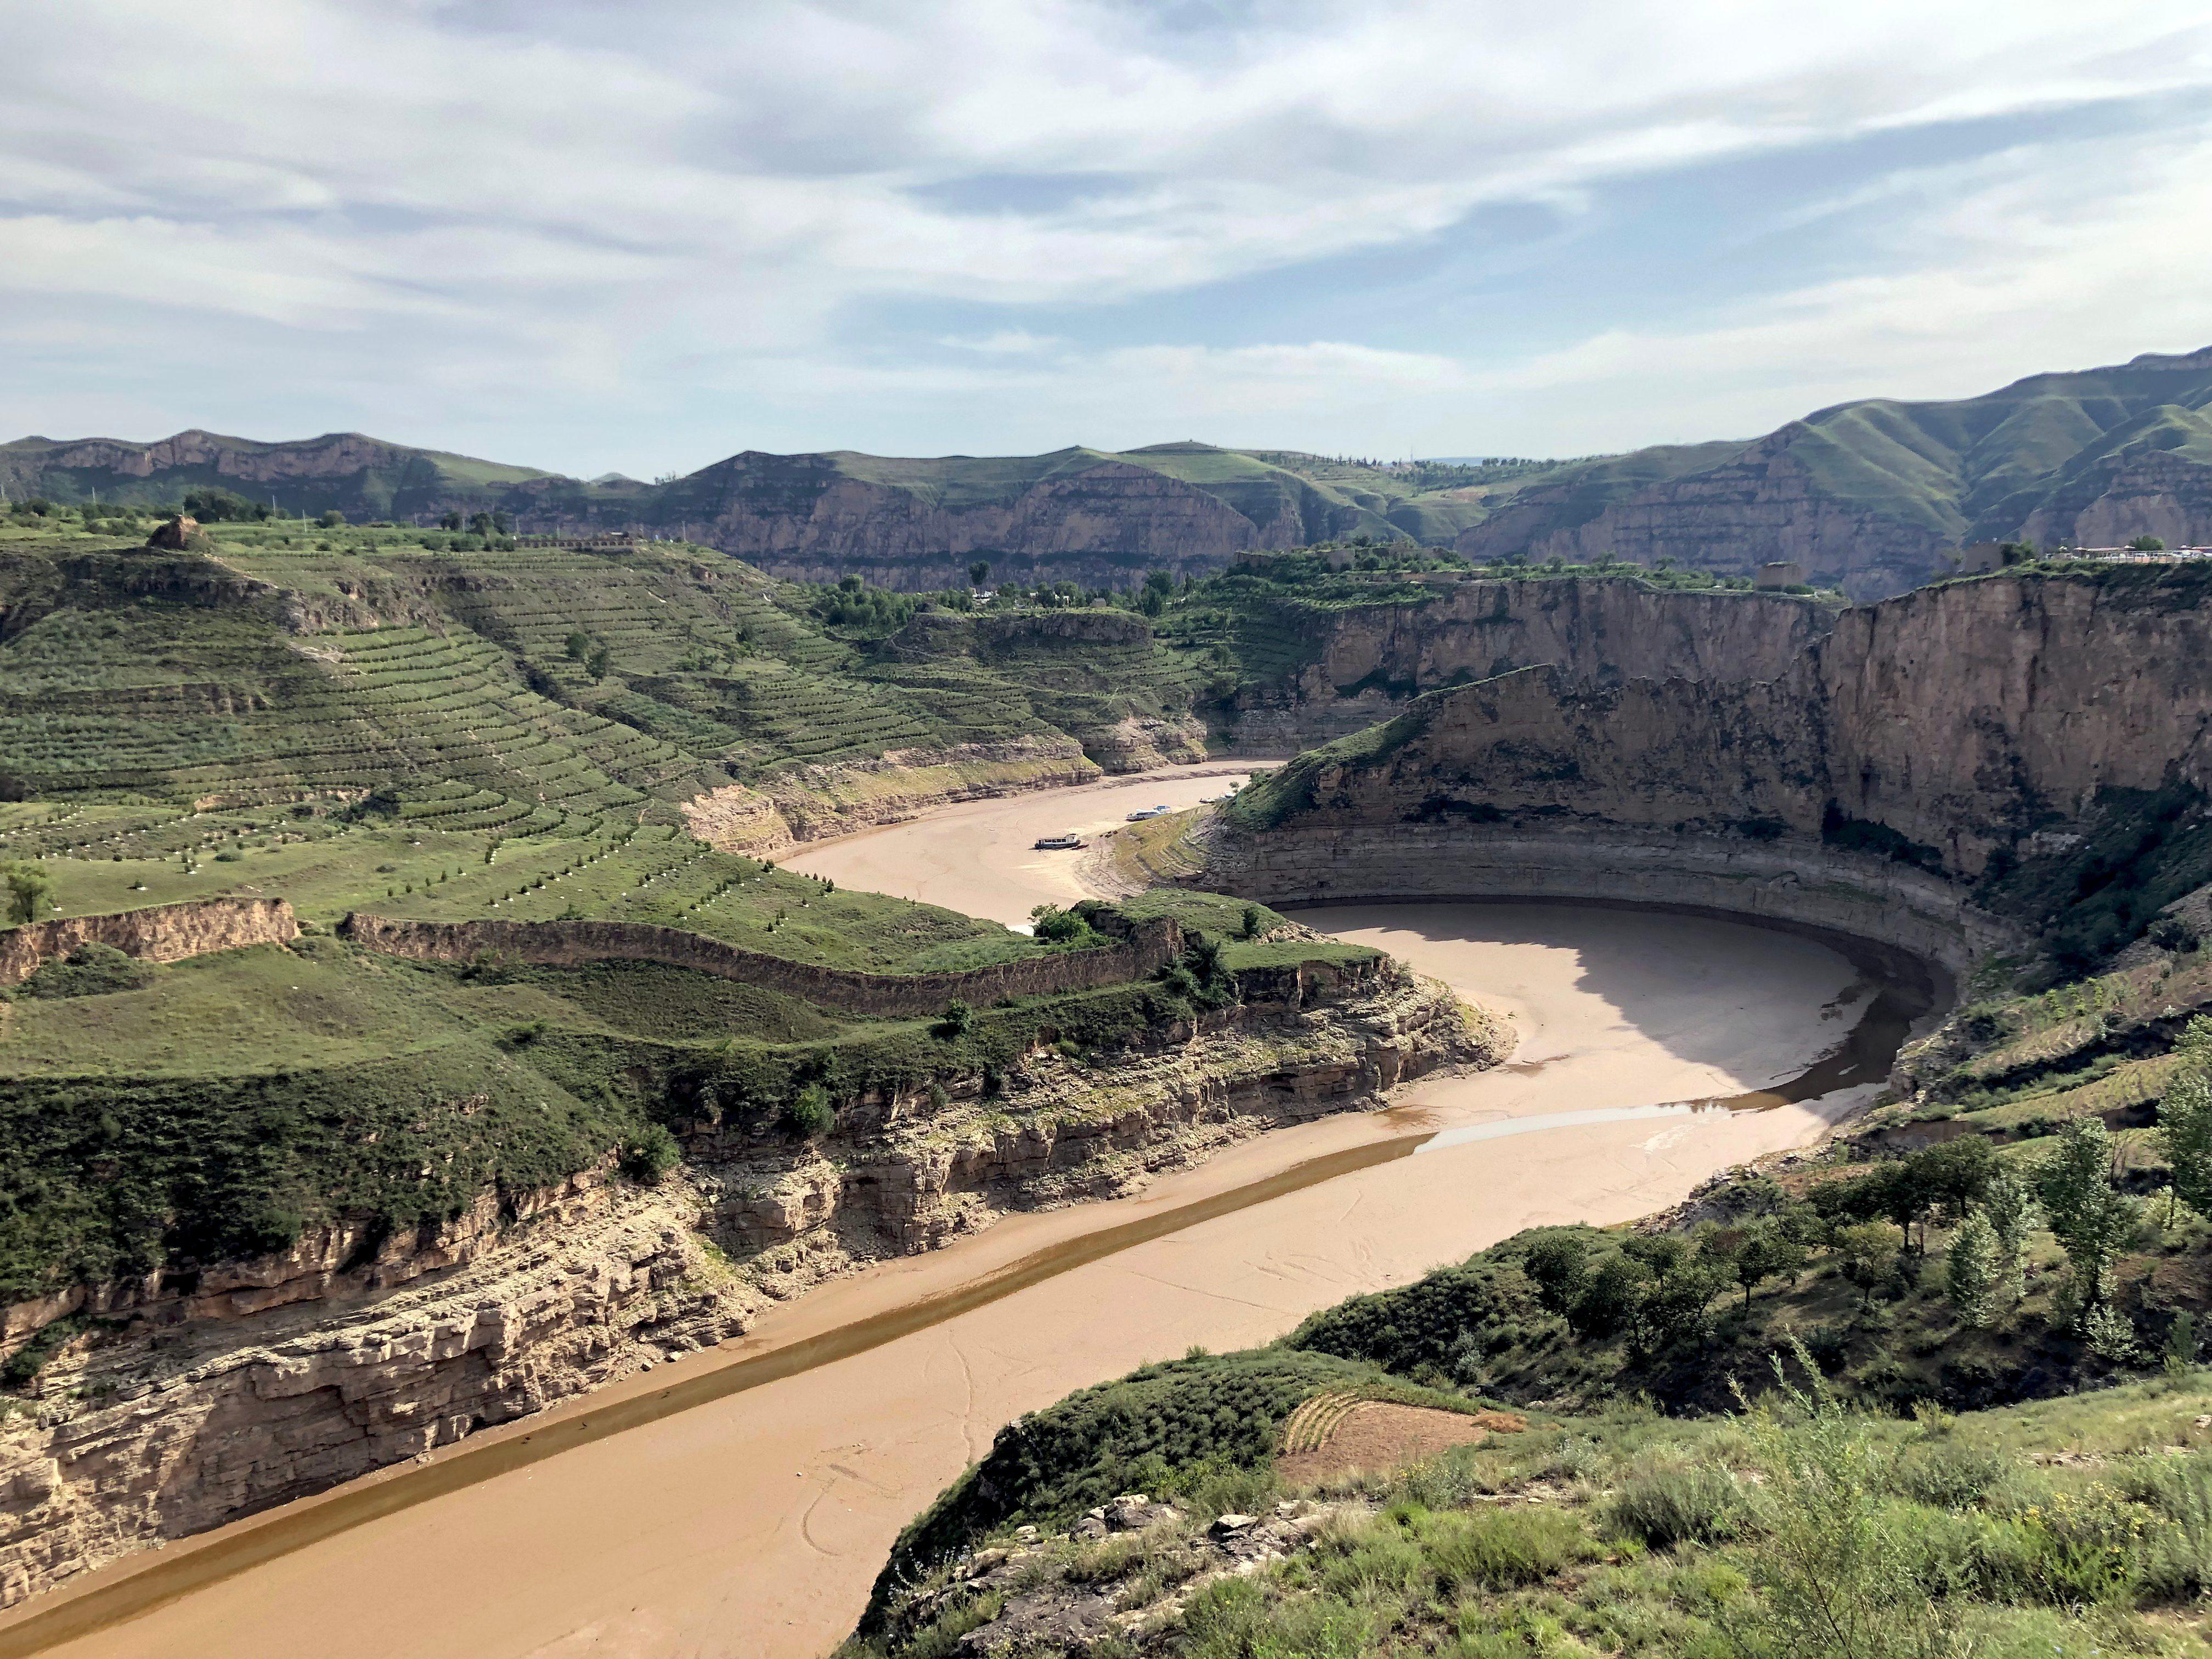 Yellow river landscape at Lao Niu Bay, Qingshui River County, County, China